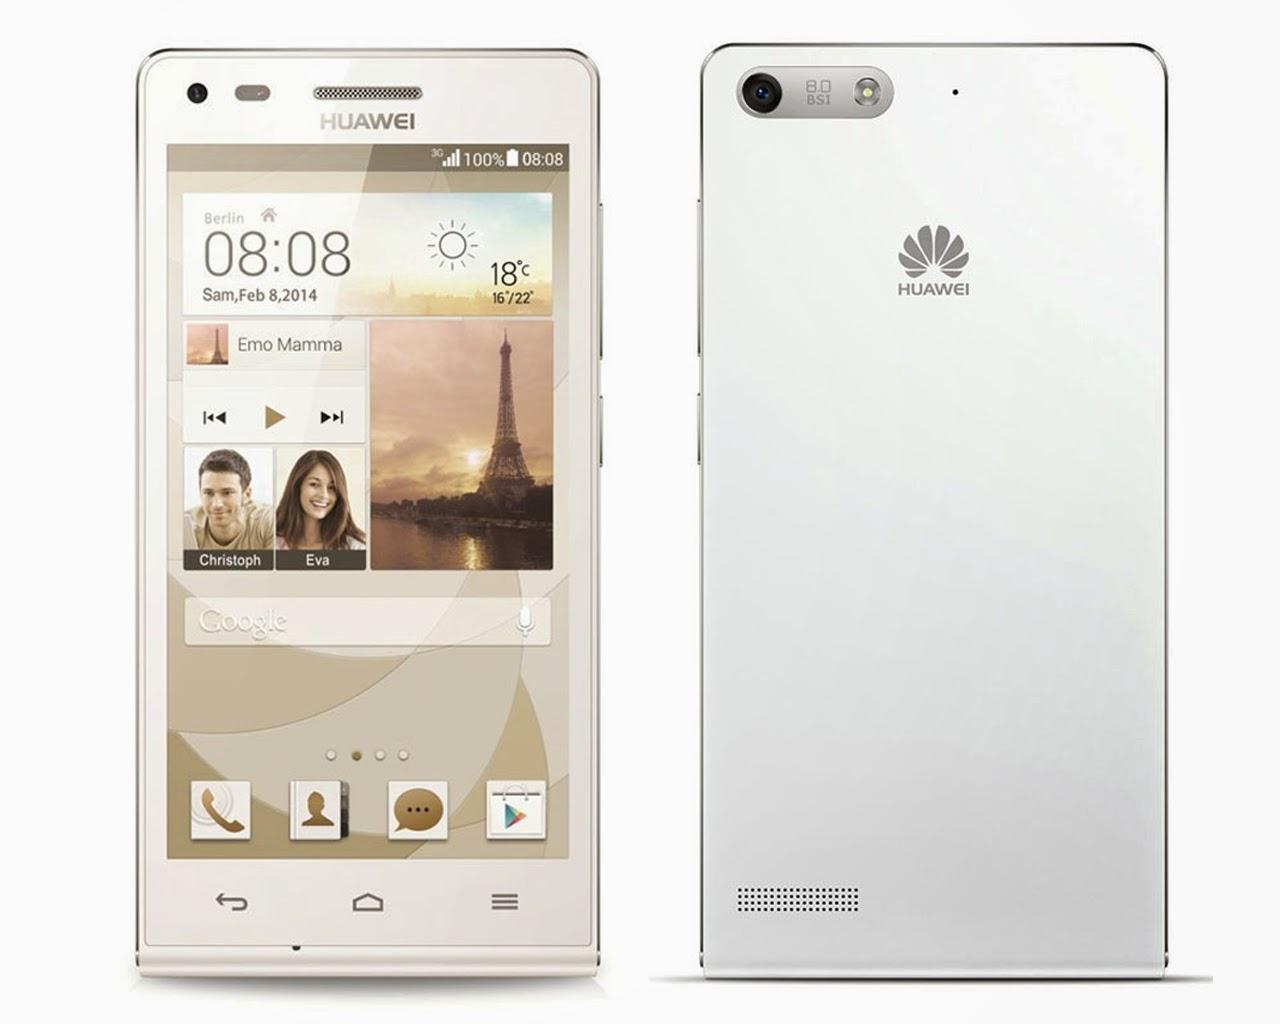 Harga Baru Huawei Ascend G6